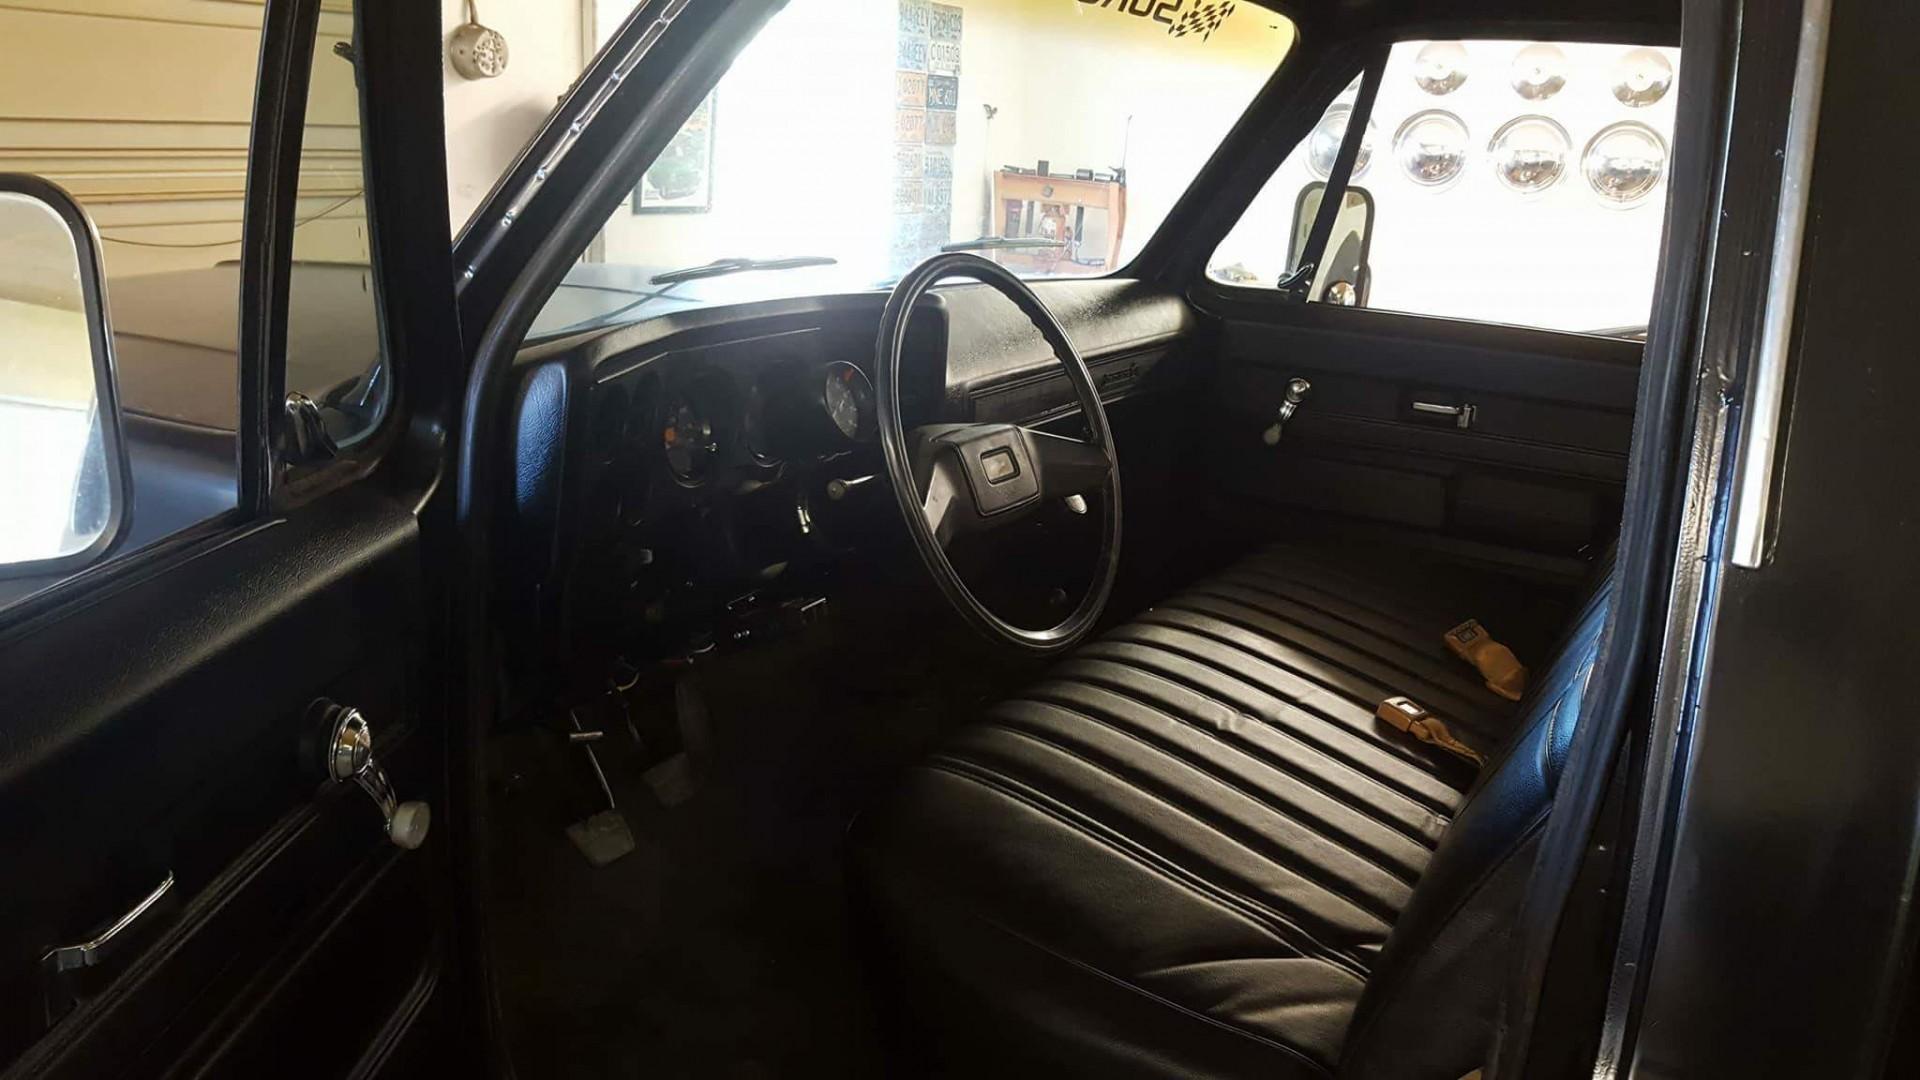 1980 Chevrolet K30 - 502ci (11)